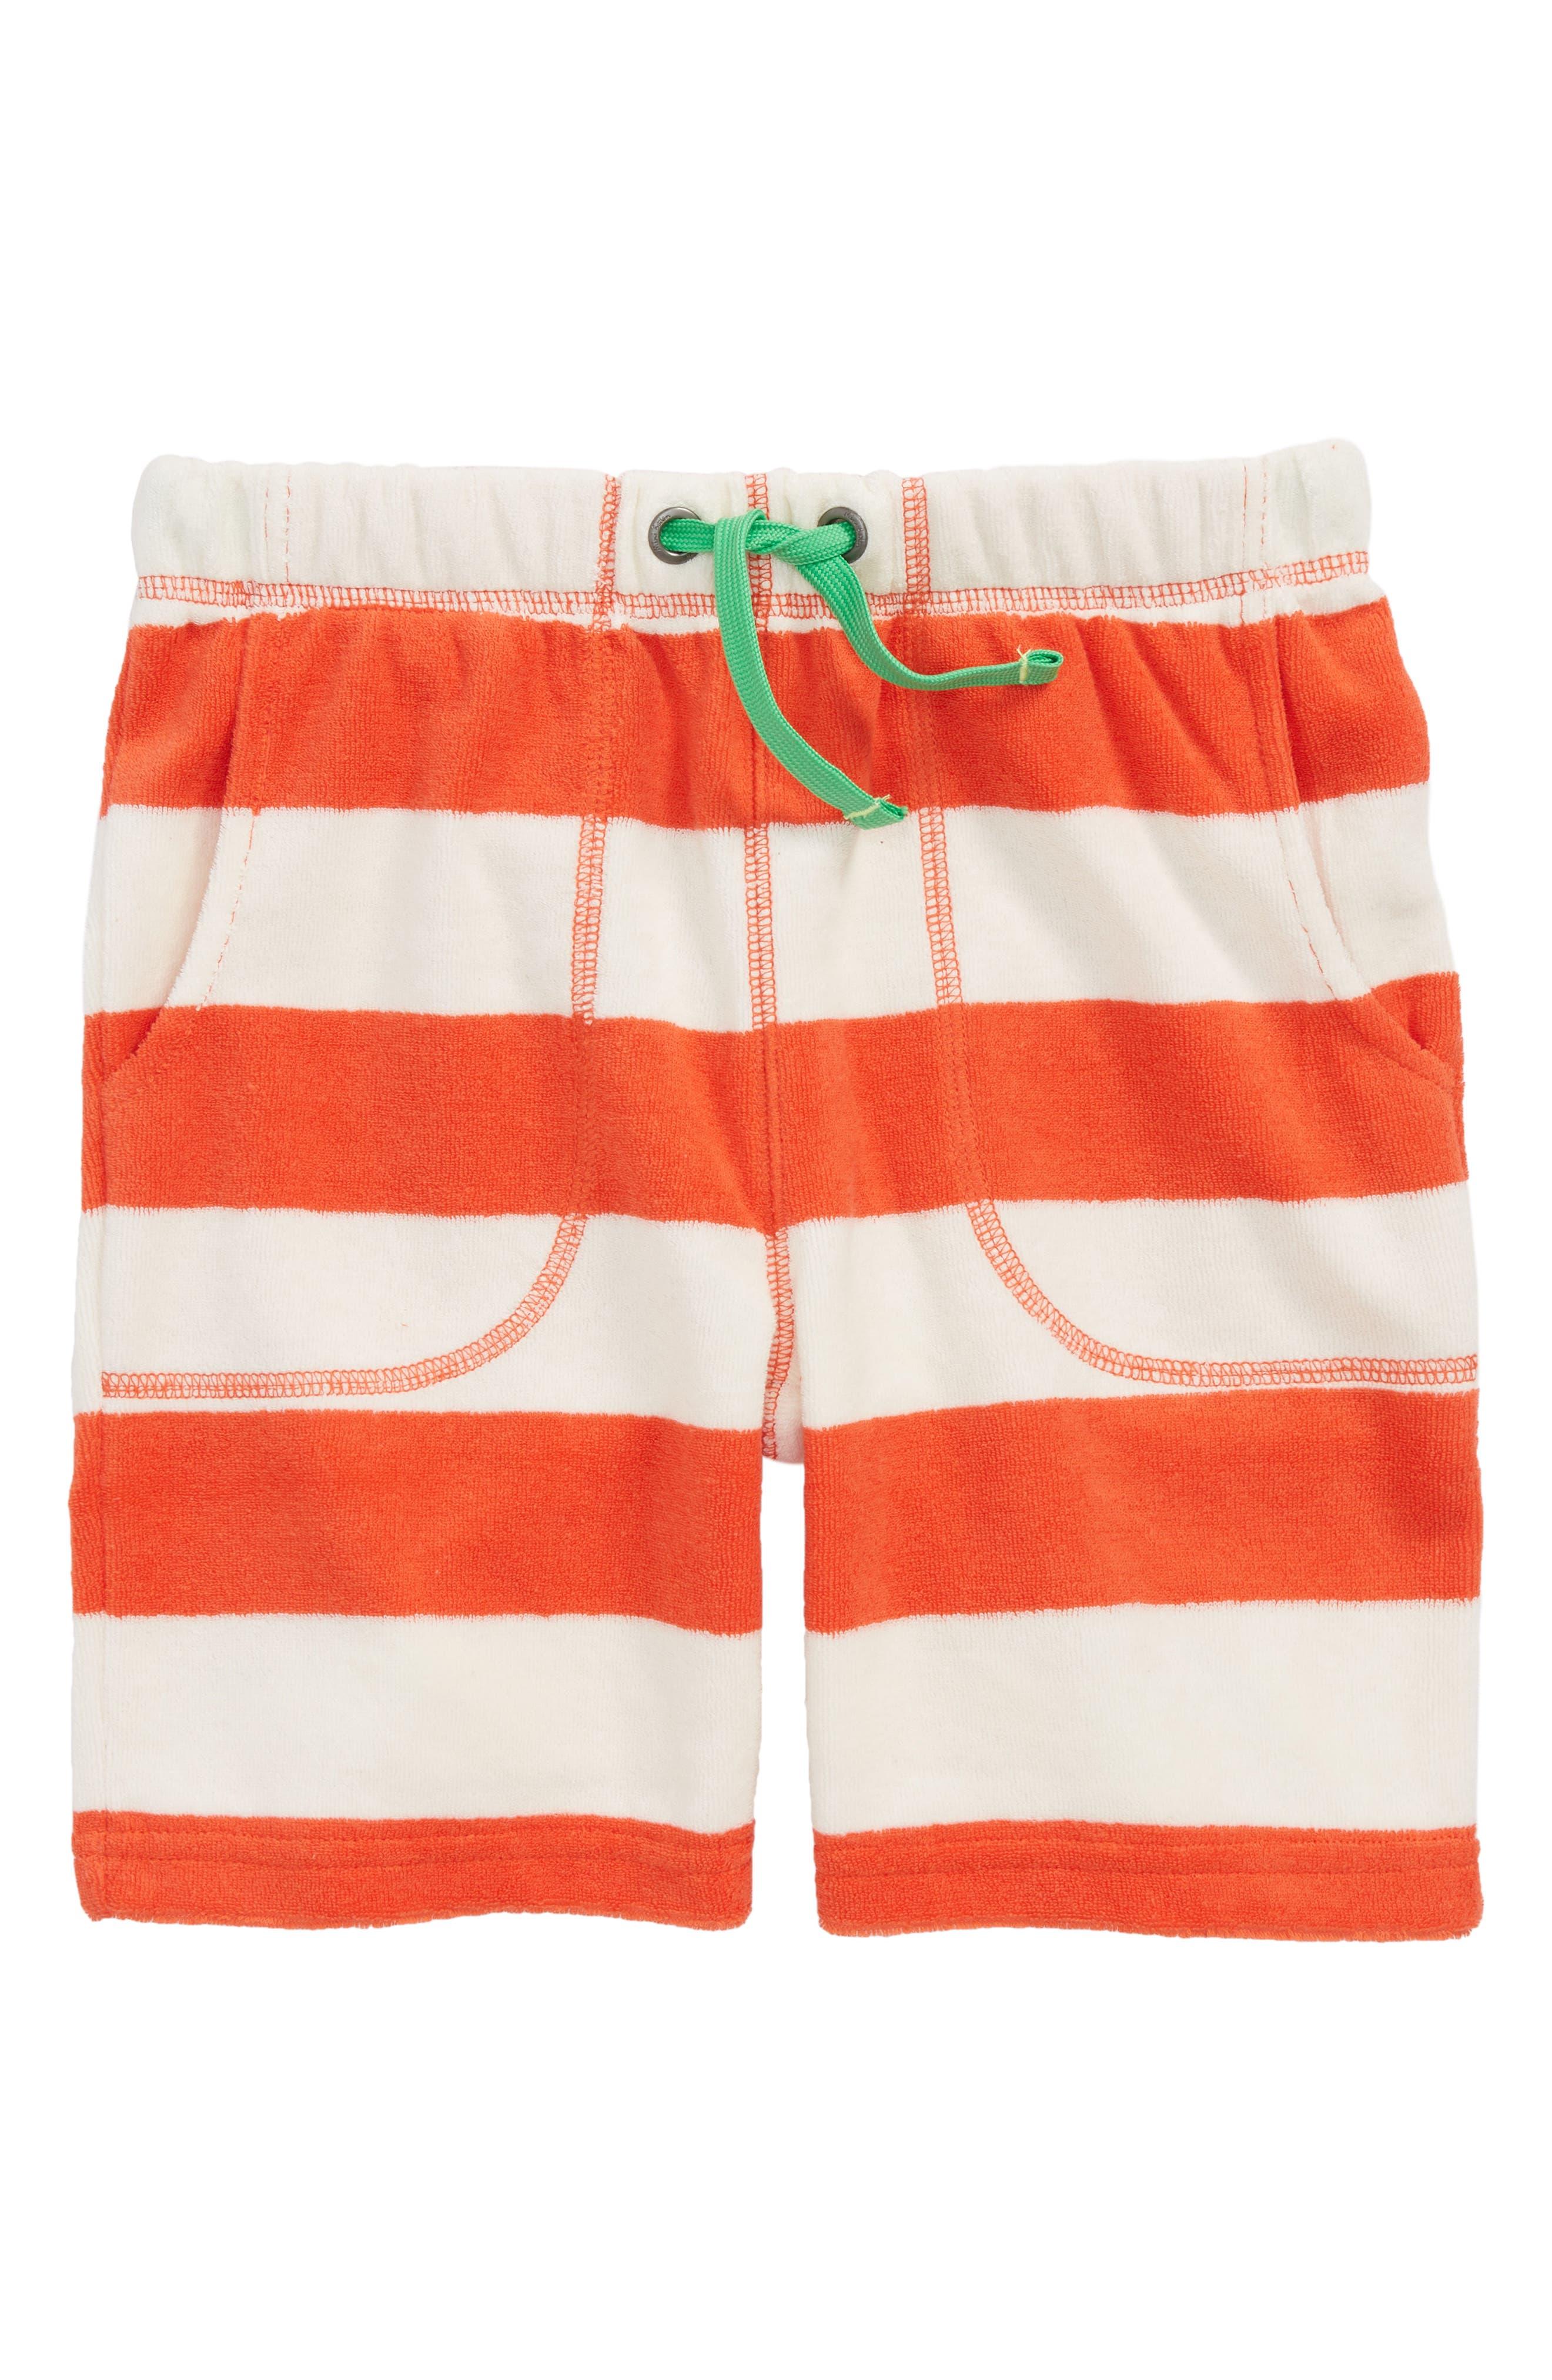 Stripe Toweling Shorts,                             Main thumbnail 1, color,                             Melon Crush Red/ Ecru